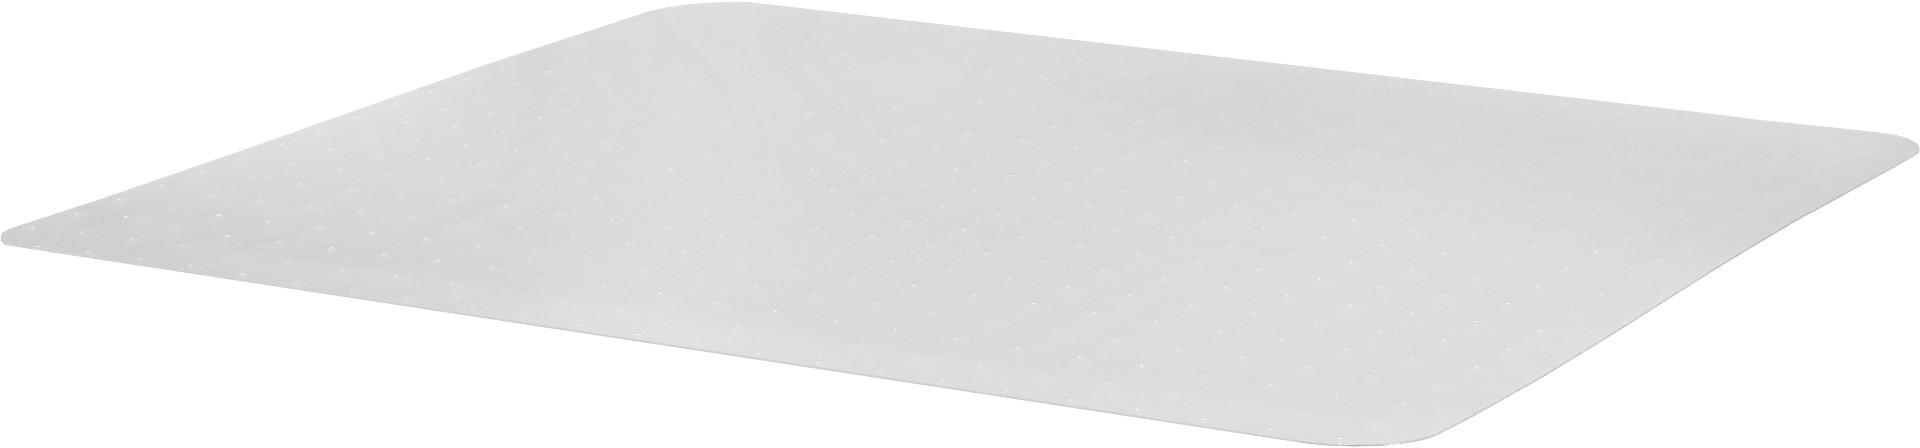 ALBERGET Carpet protector - IKEA